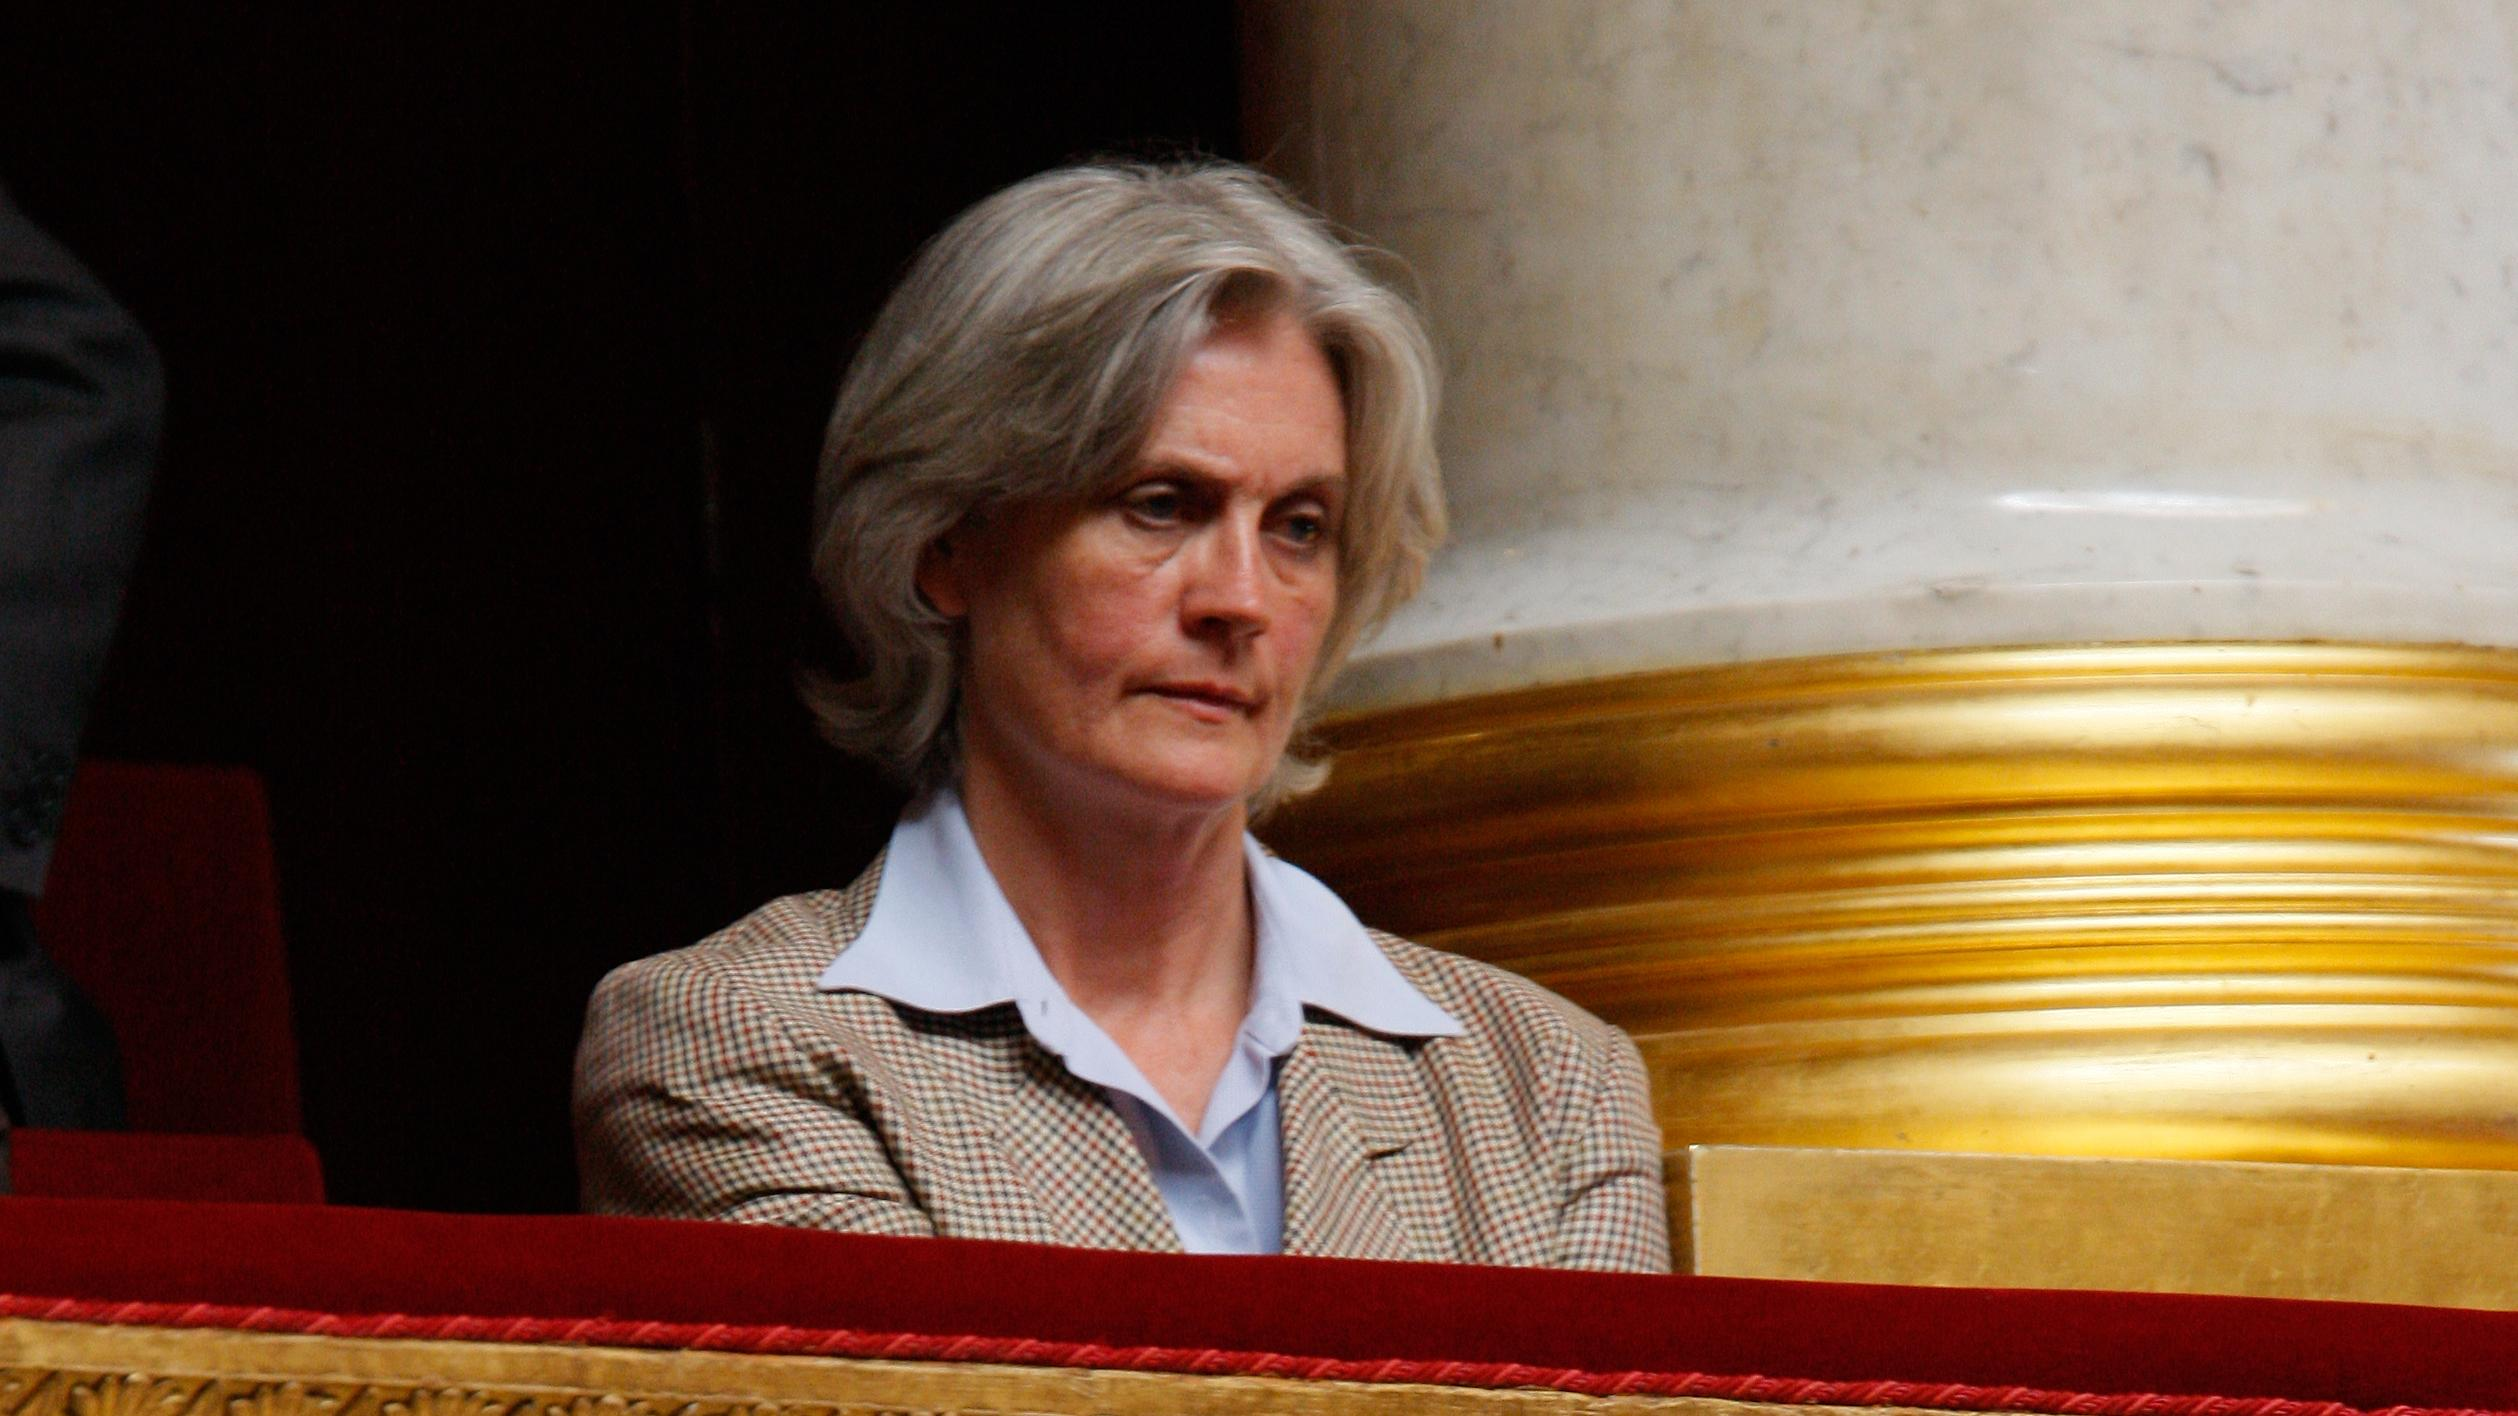 udland Fransk praesidentkandidat Min kone har altid arbejdet for mig artikel